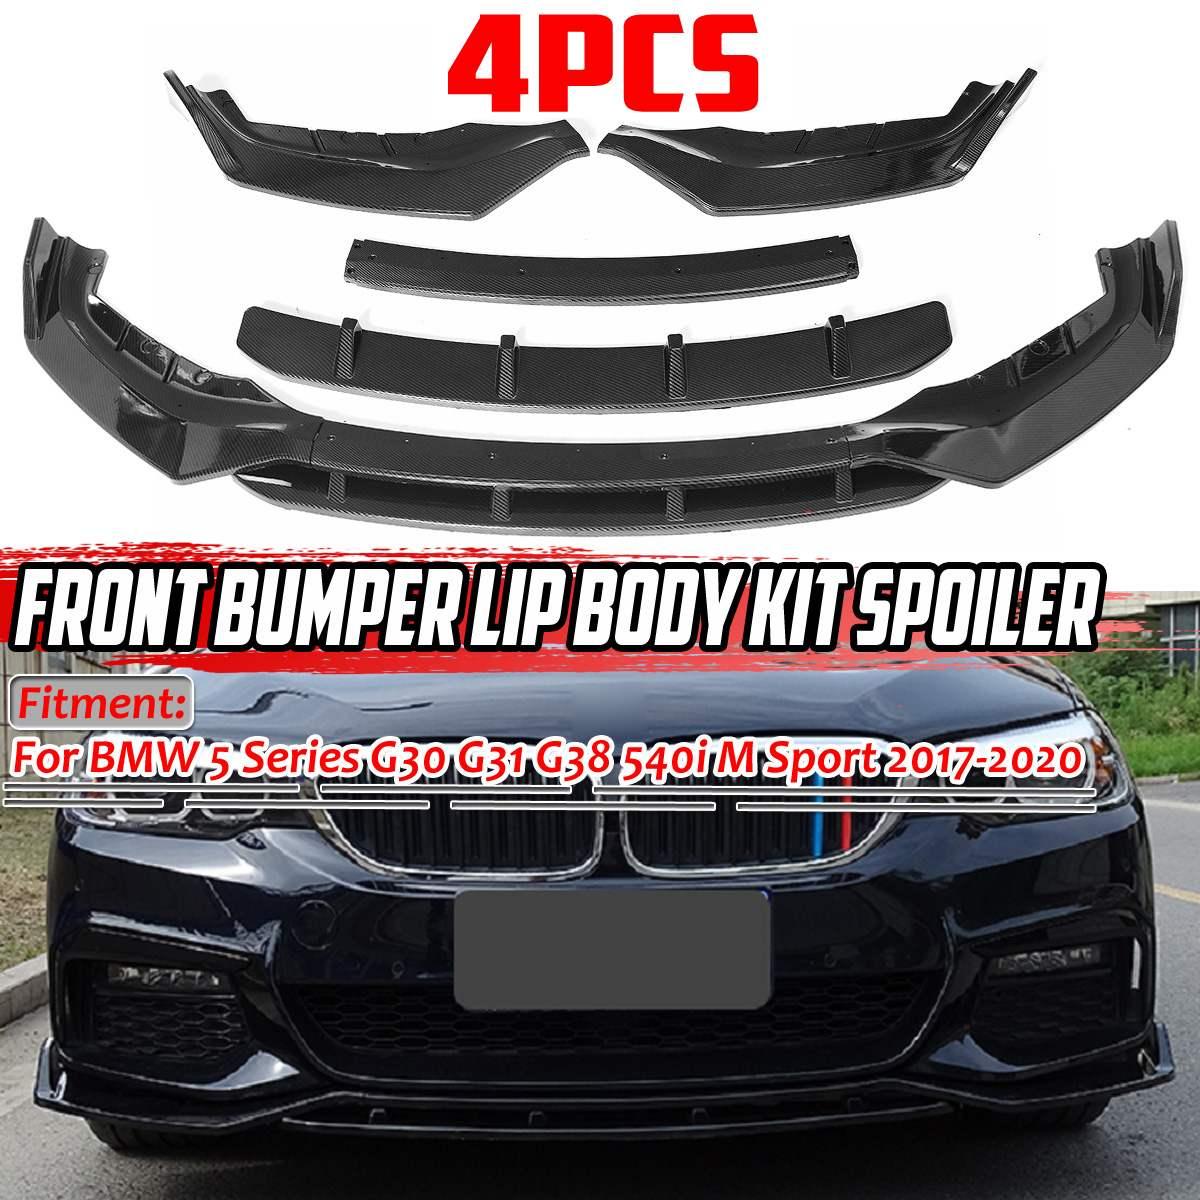 G30 бампер для автомобиля передний бампер сплиттер спойлер диффузор Защитная крышка для BMW 5 серии G30 G31 G38 540i M Спорт 2017-2020